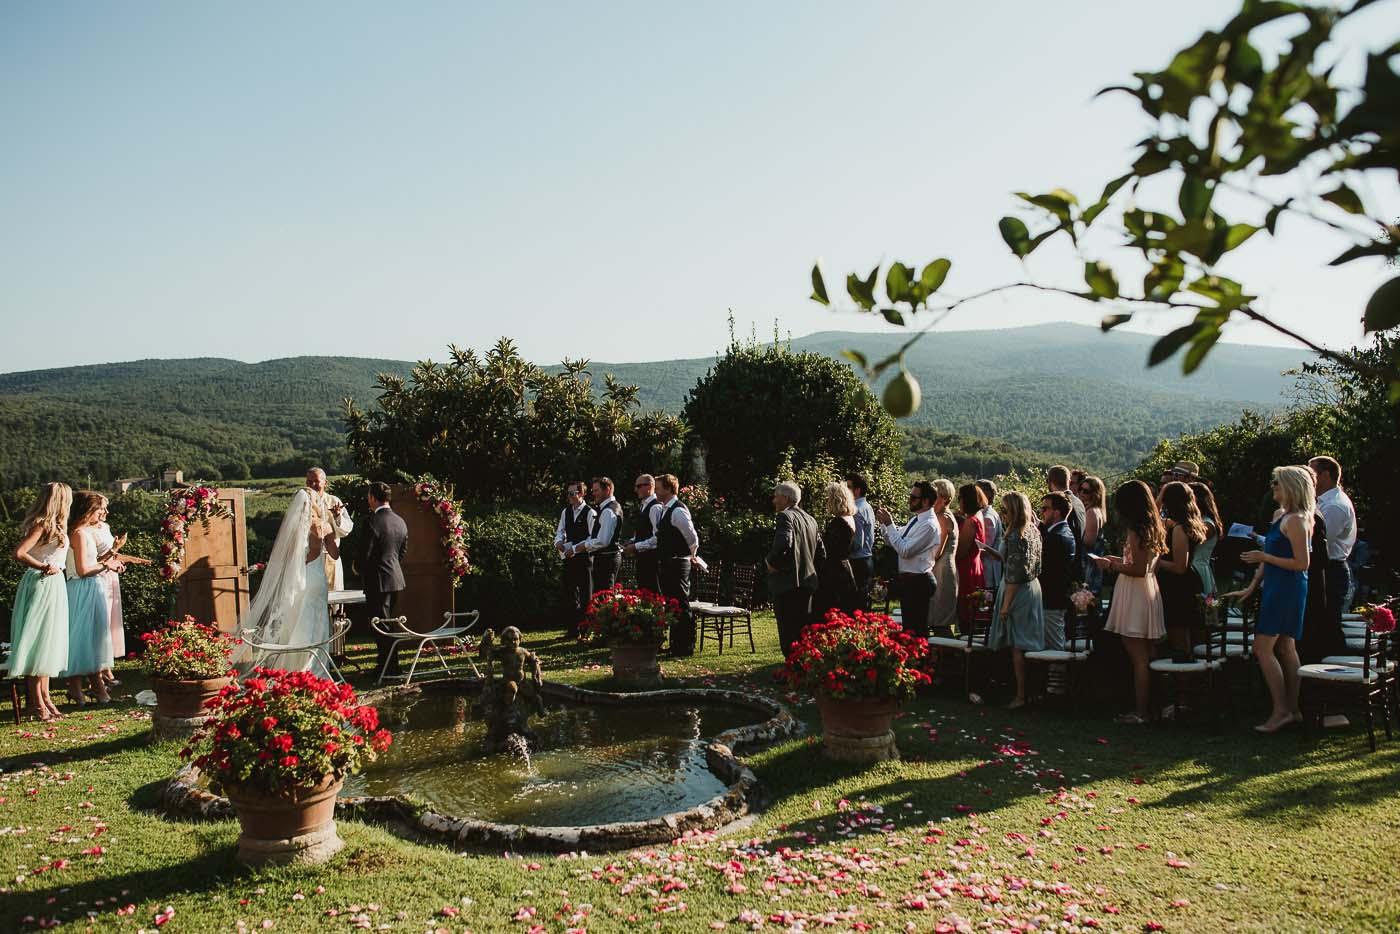 Relaxed-wedding-borgo-stomennano-1111